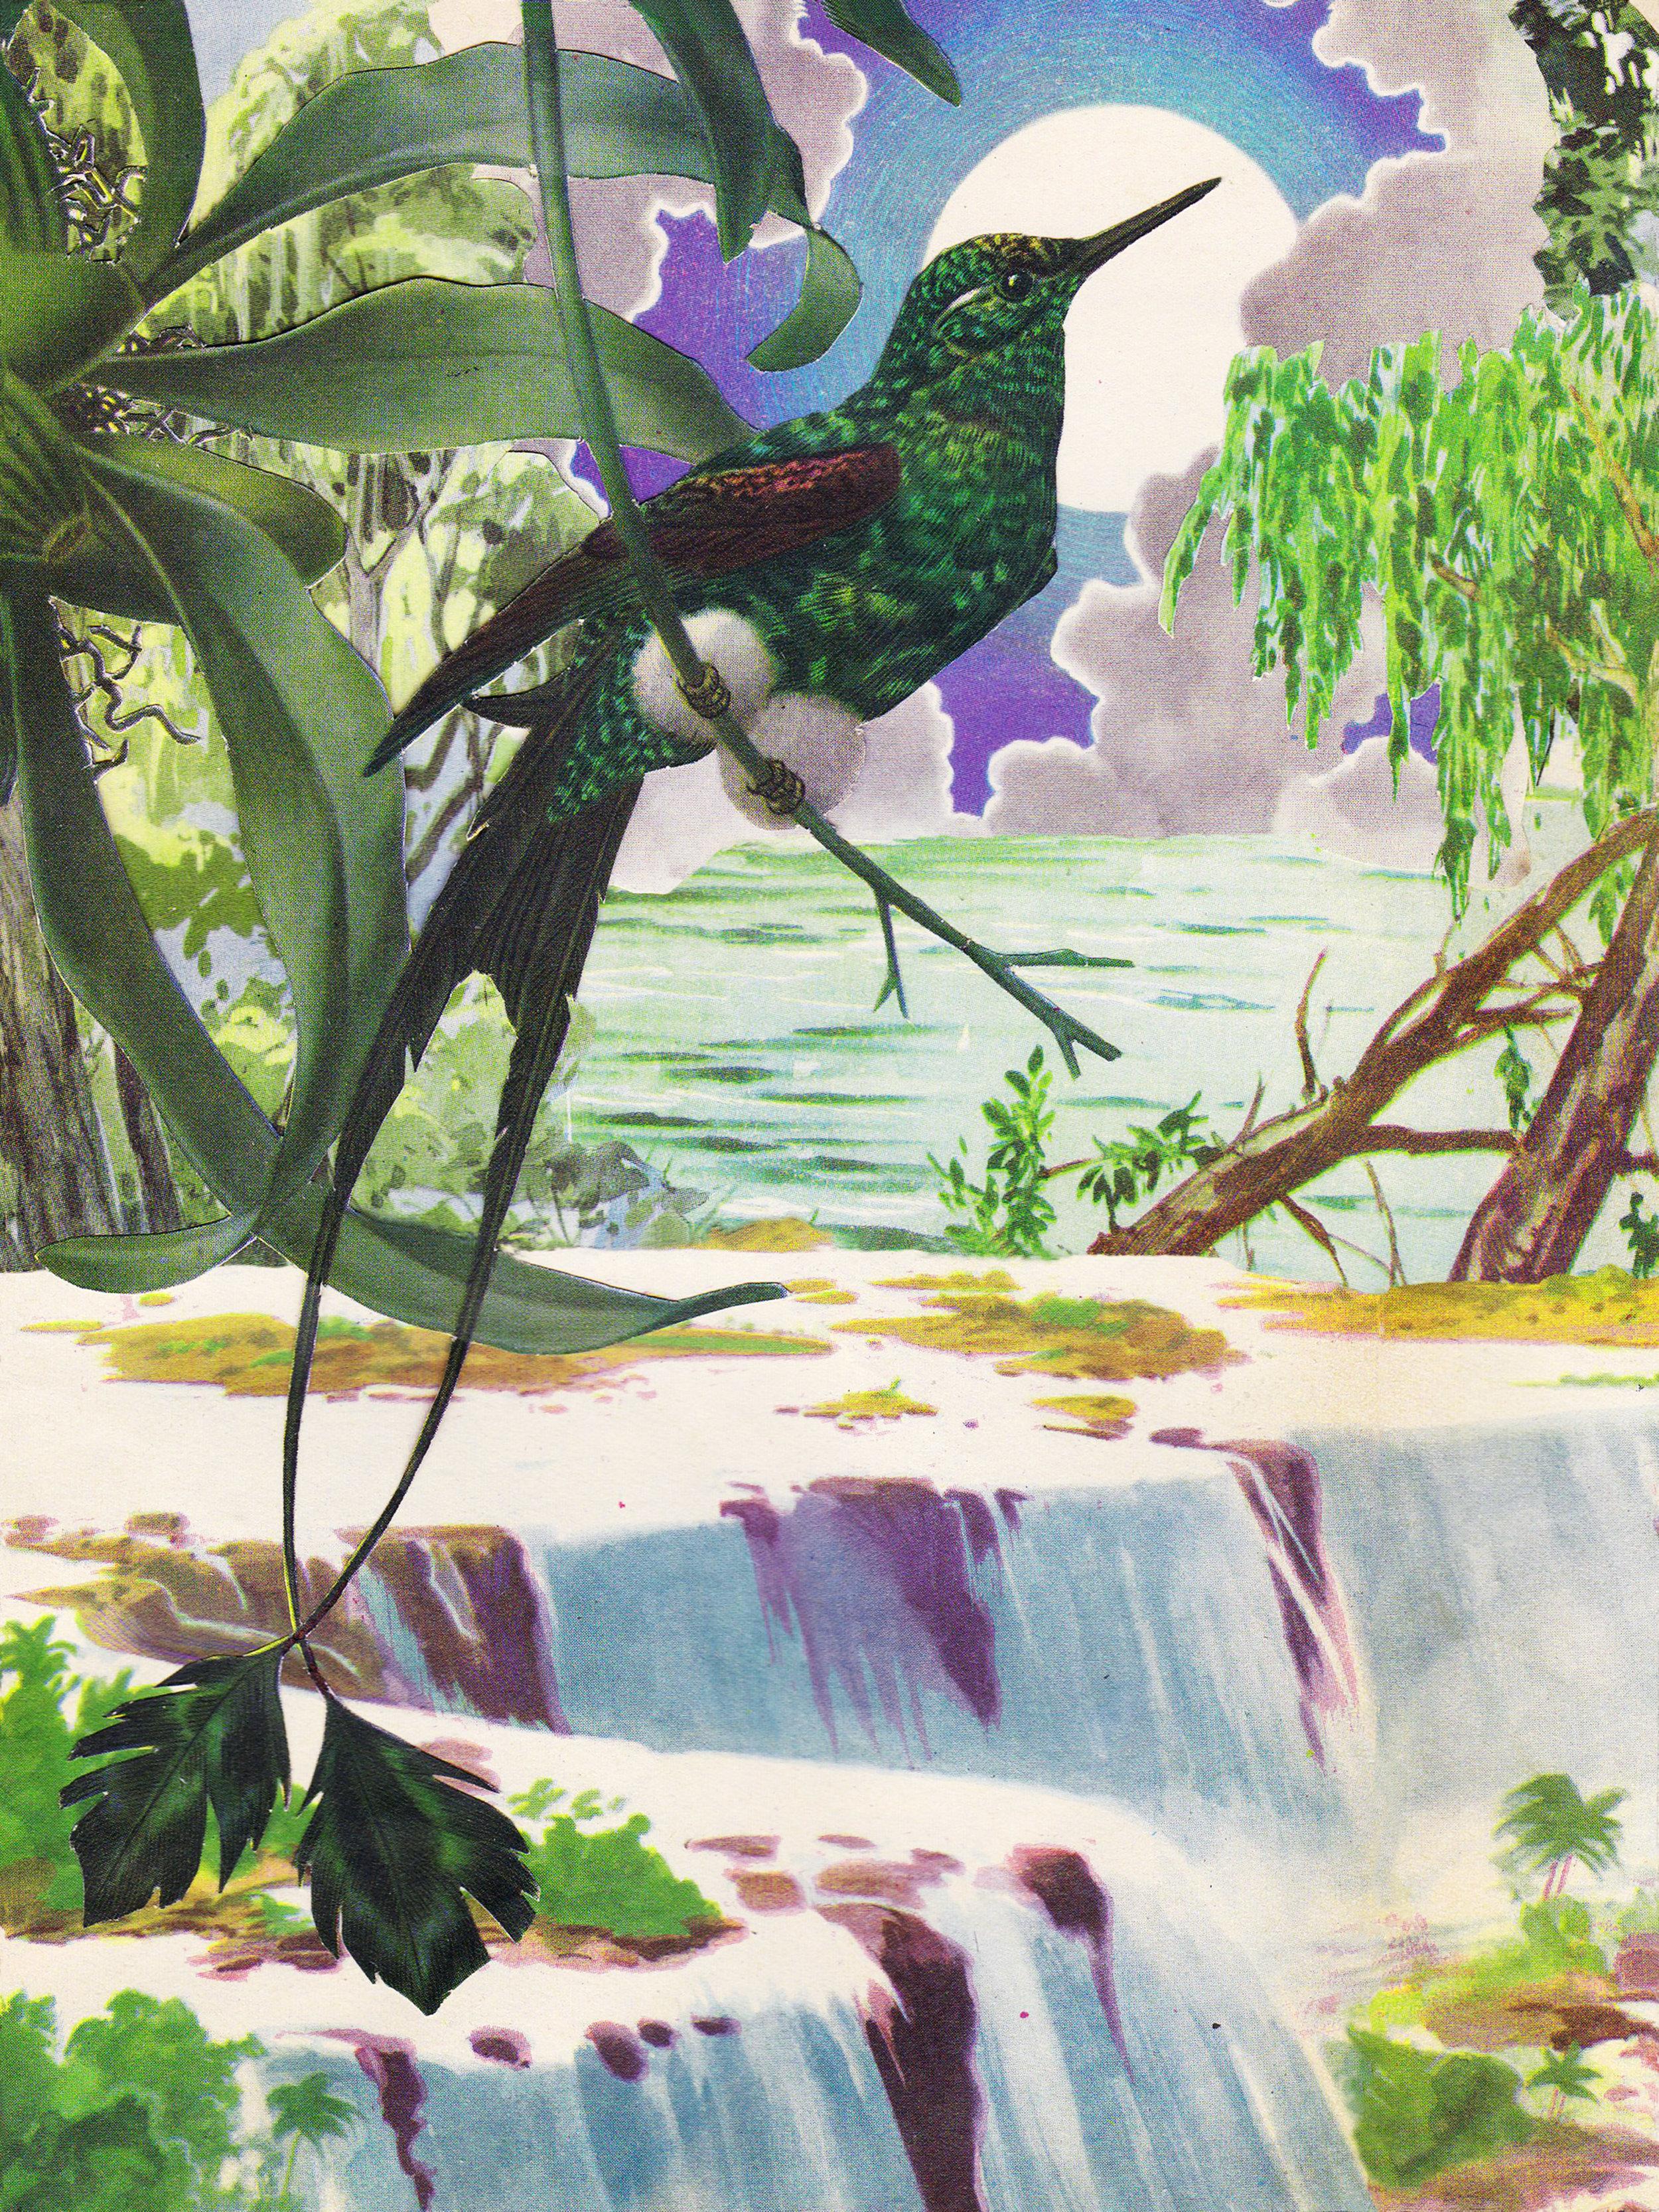 El rio    fine art print, limited edition  Canson® Infinity Edition Etching Rag 310 g/m²  65 X 50 CM    4000 ars